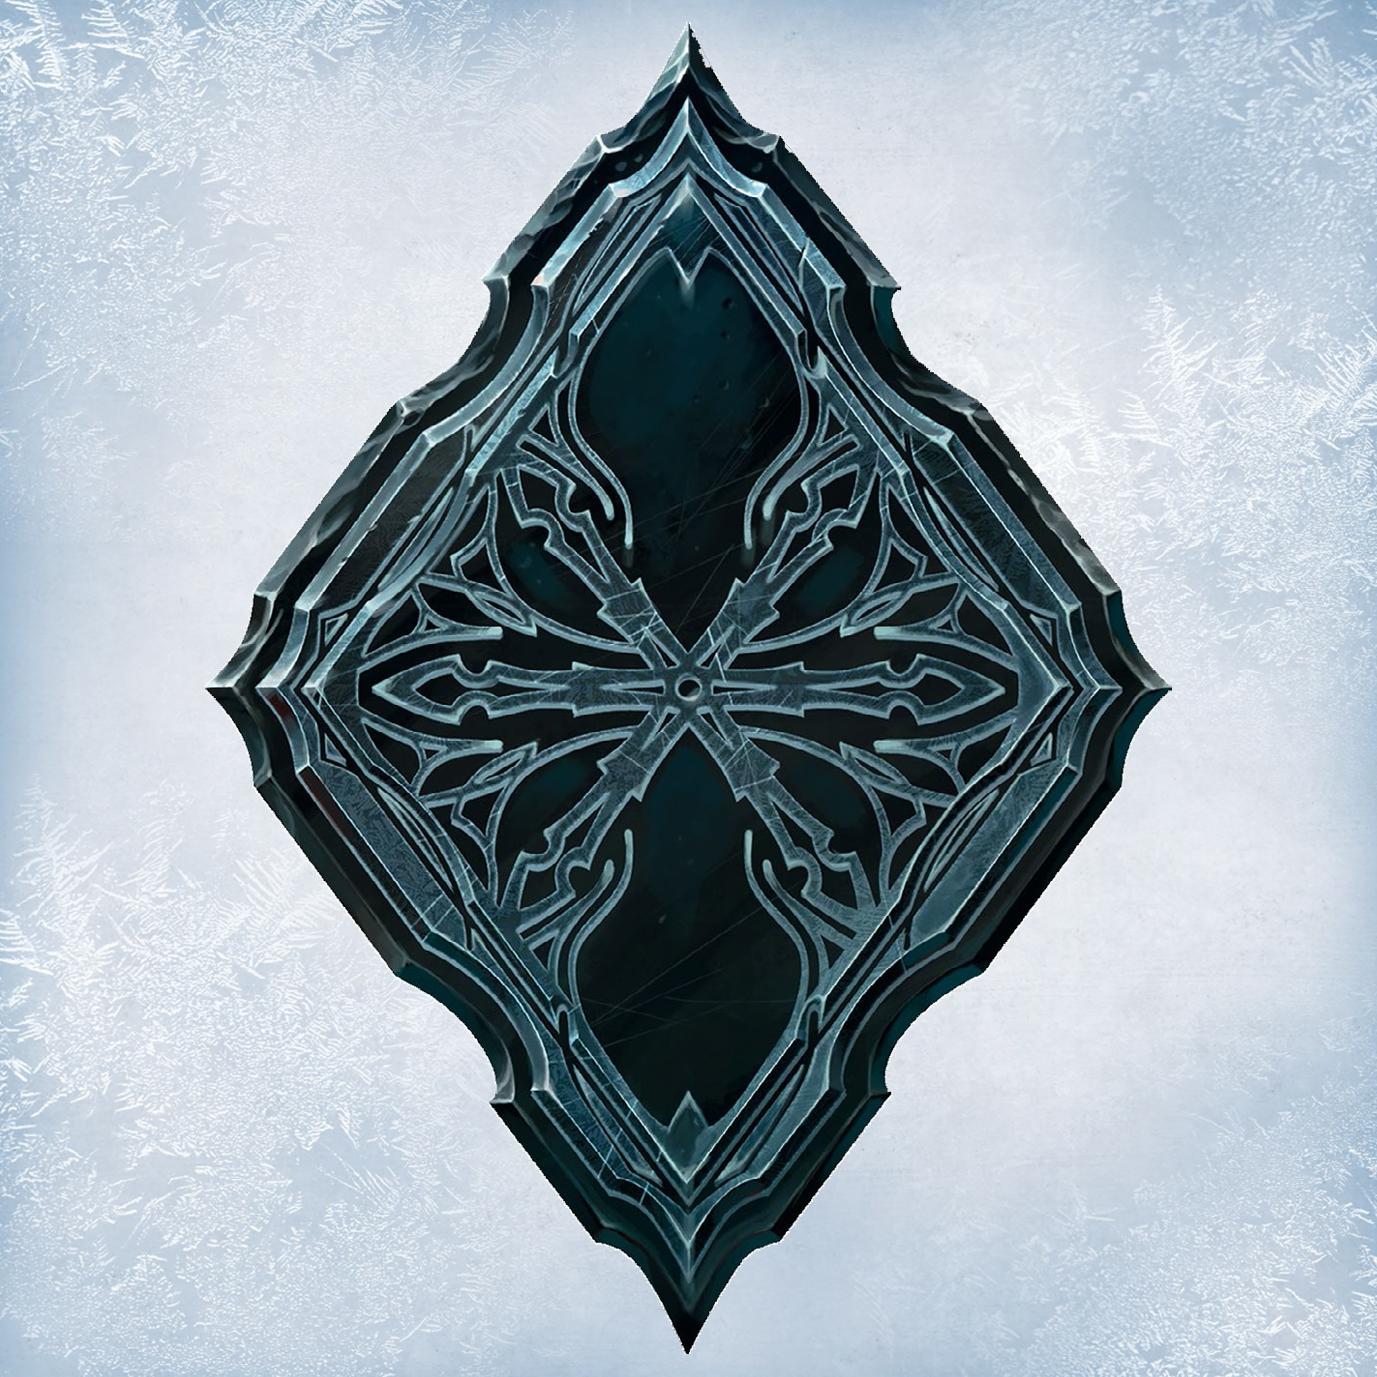 Image Symbol Of Aurilg Forgotten Realms Wiki Fandom Powered